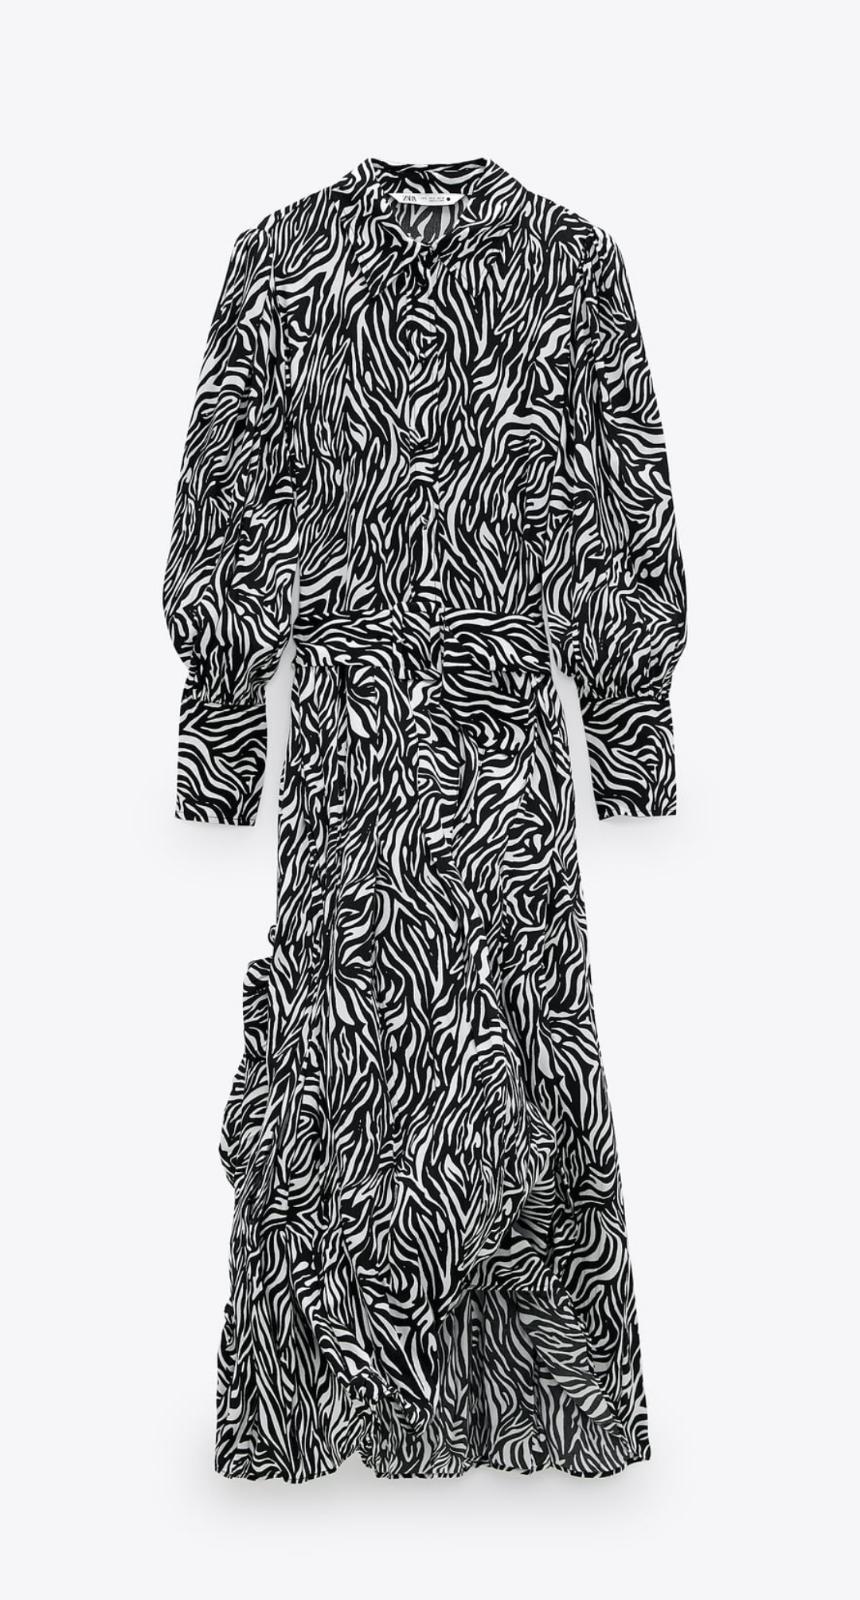 Vestido maxi de cebra de Zara